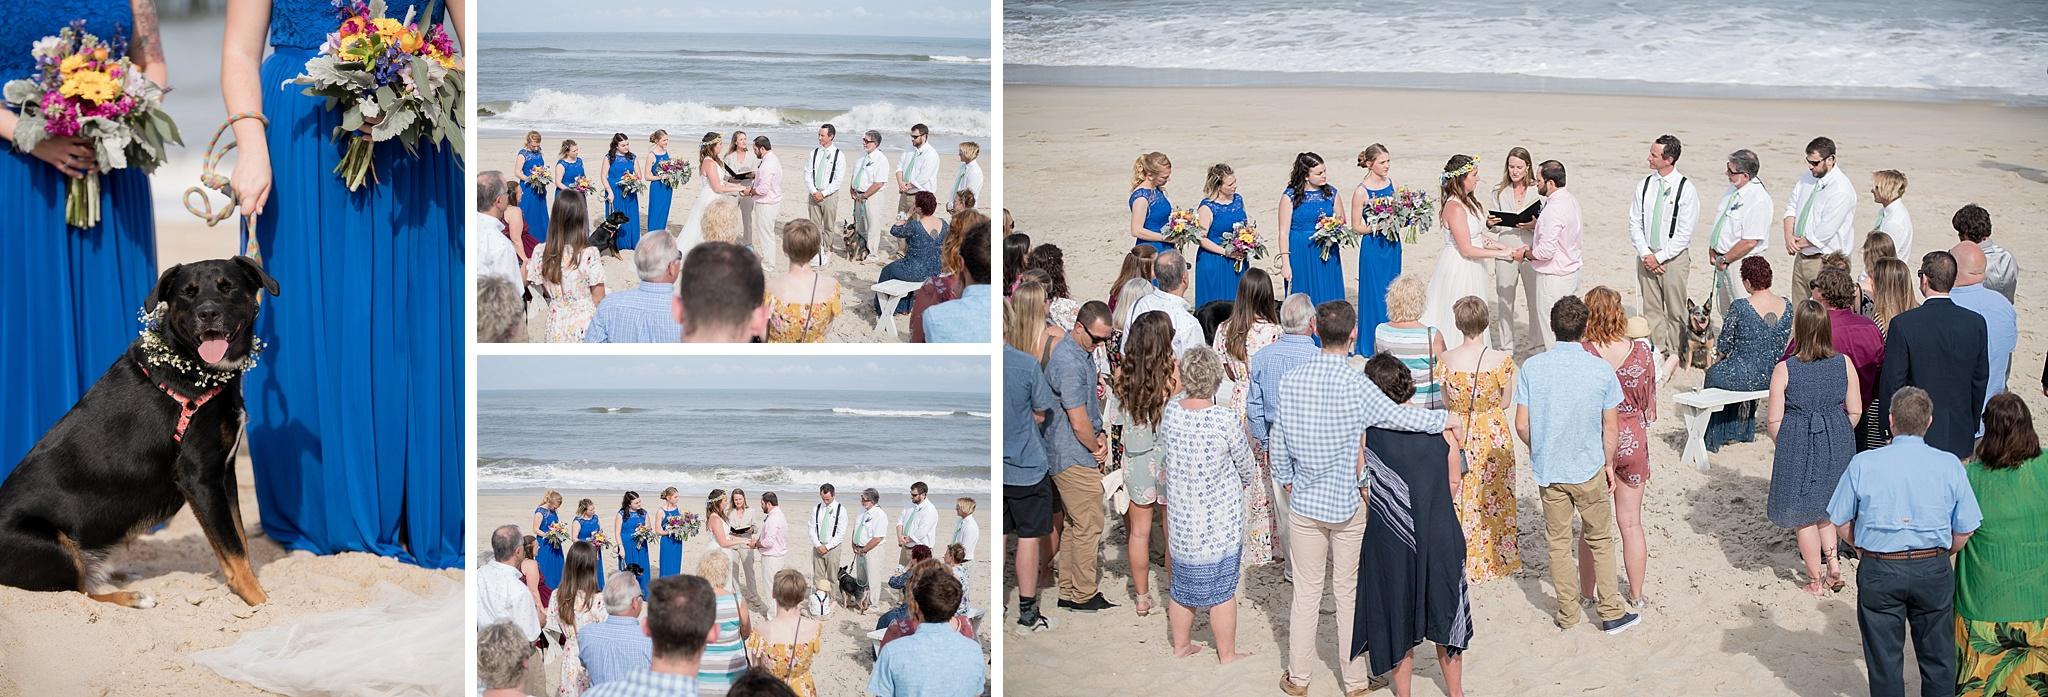 Avon-NC-Wedding-Photographer-195.jpg